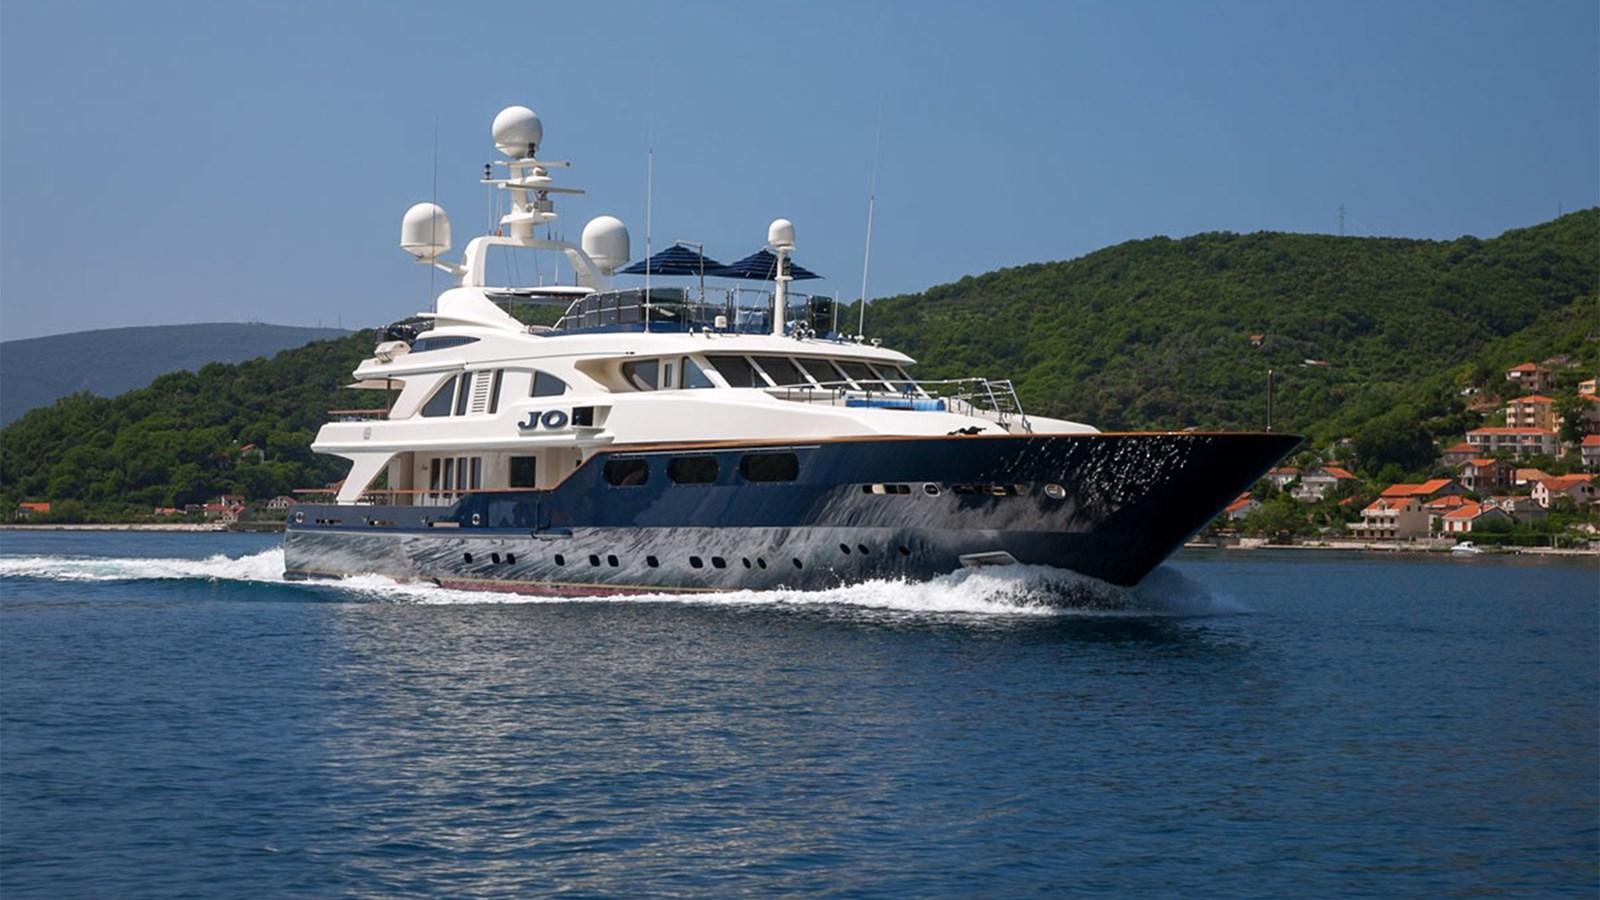 Motor Yacht JO for Sale with SuperYachtsMonaco